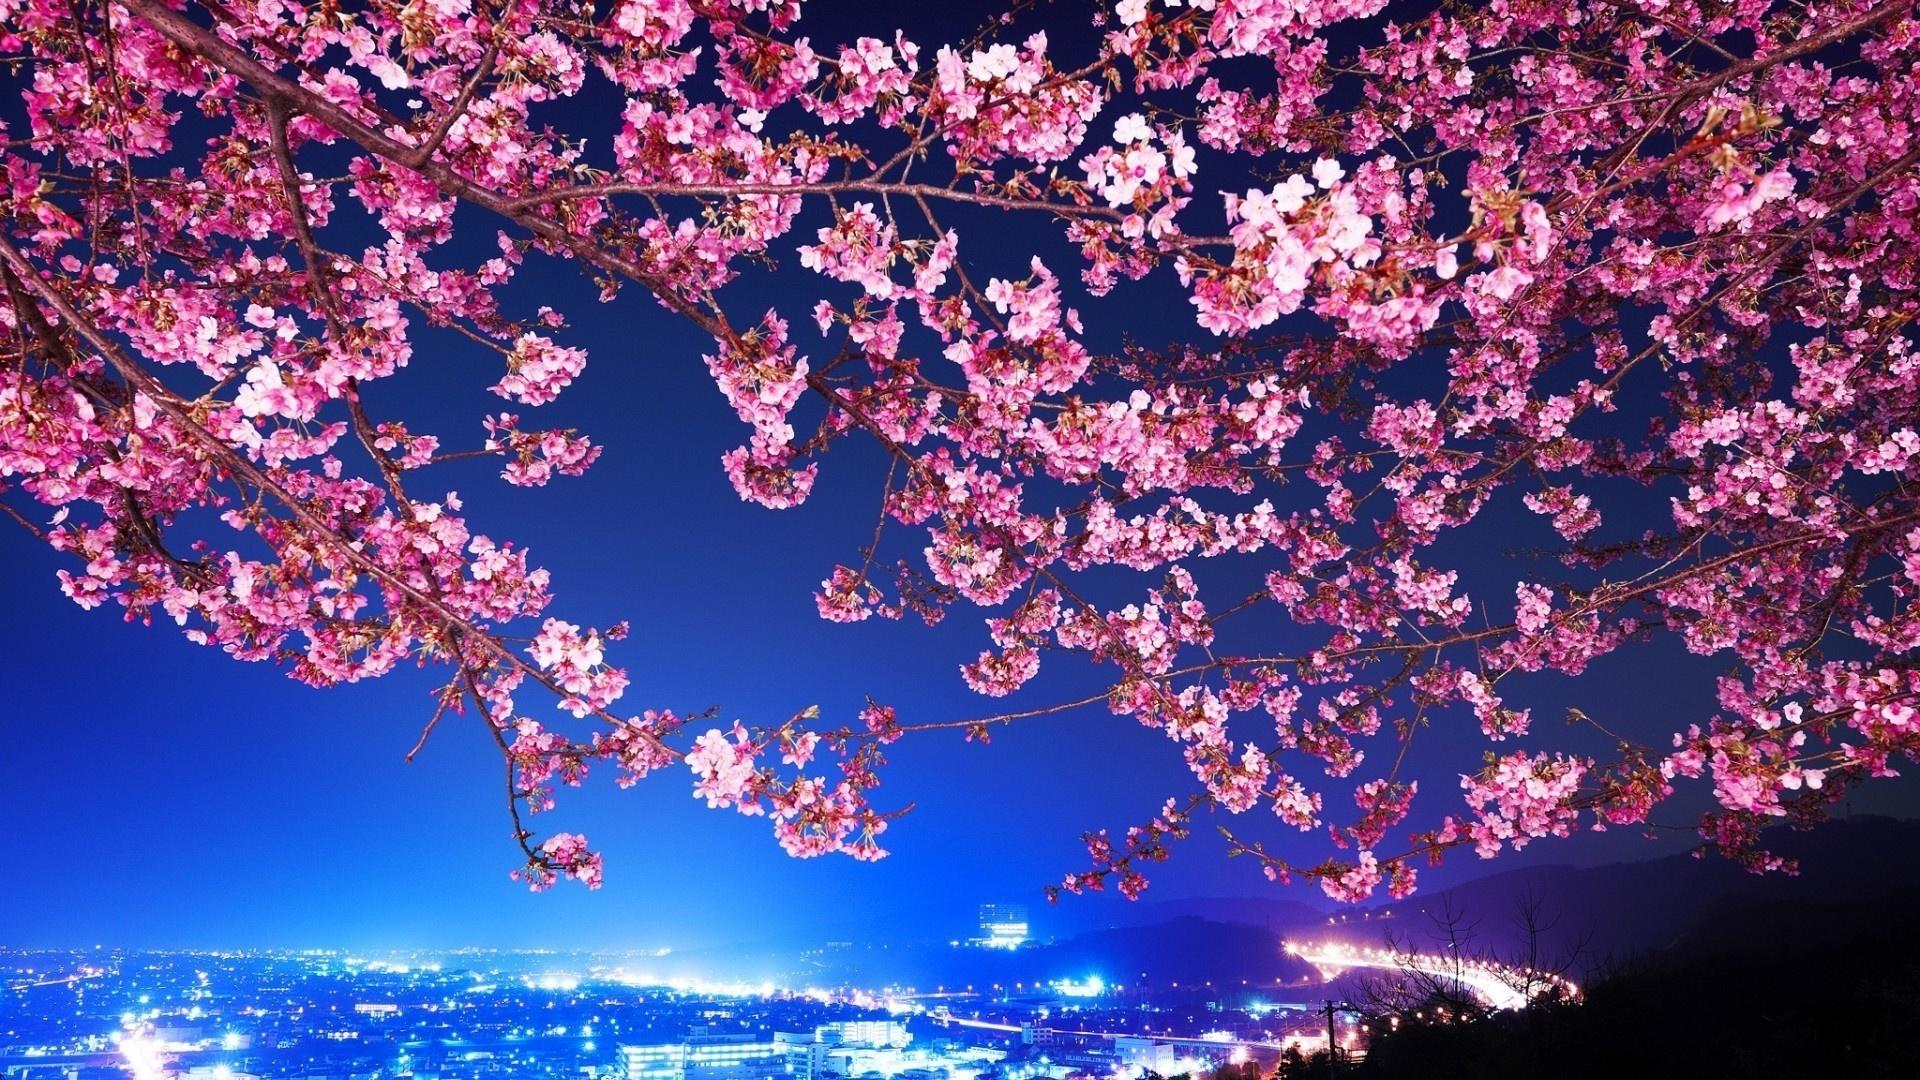 Sakura Blossom Image